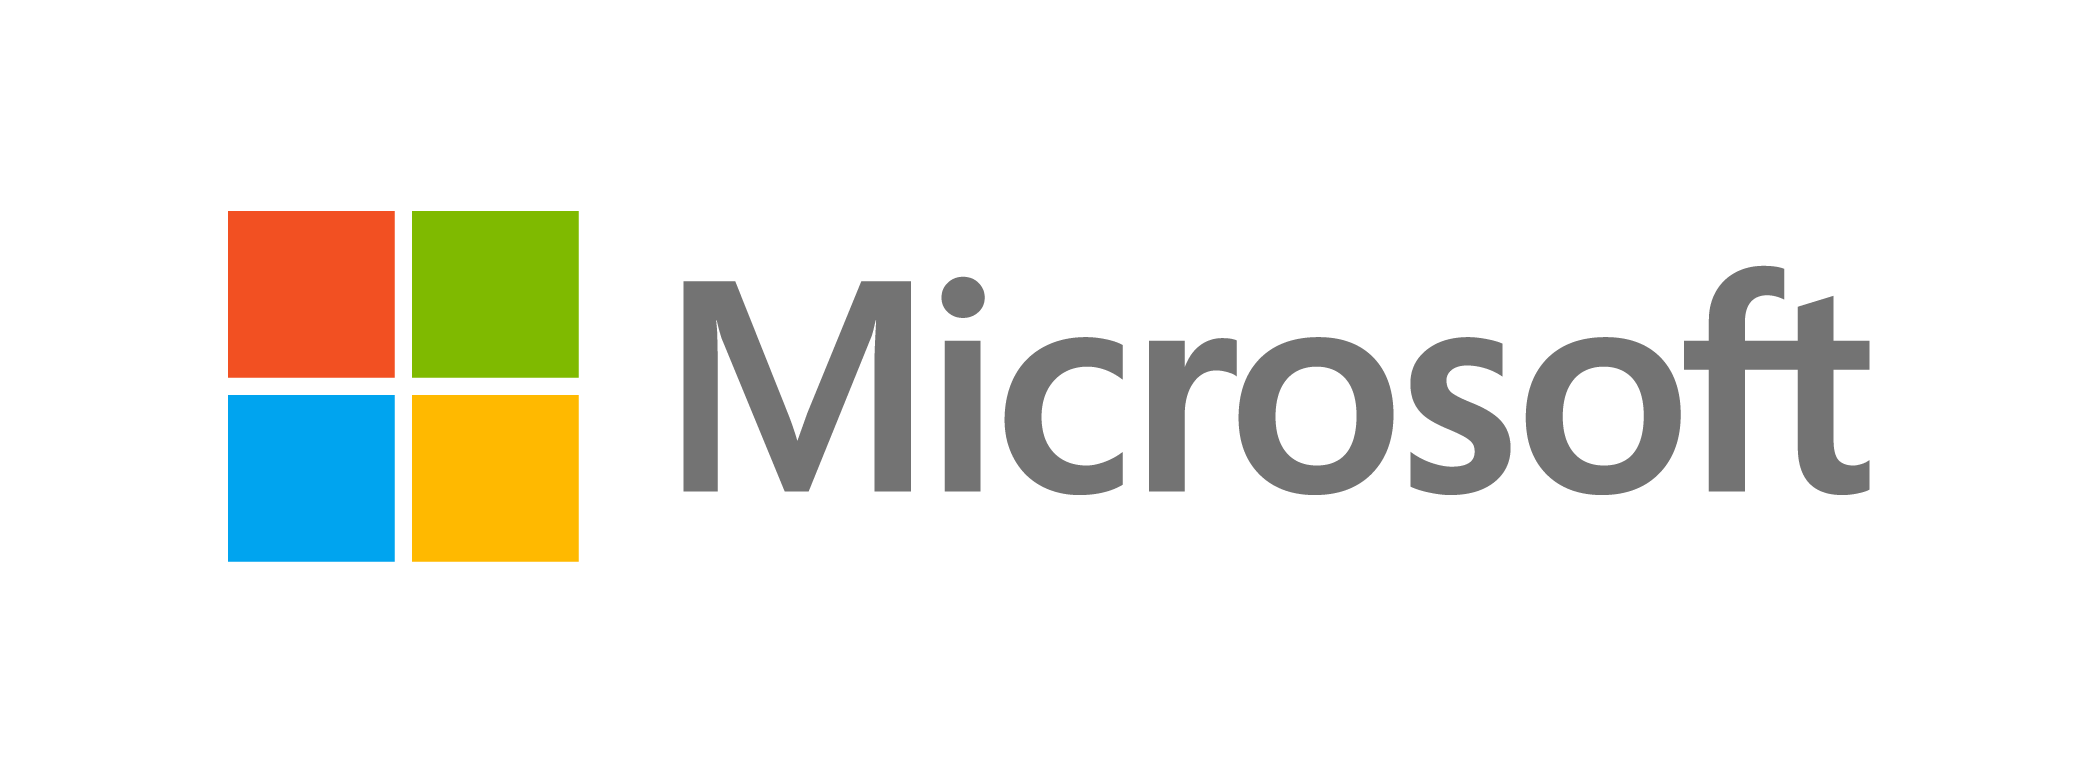 Education Week Microsoft Microsoft Windows Logos